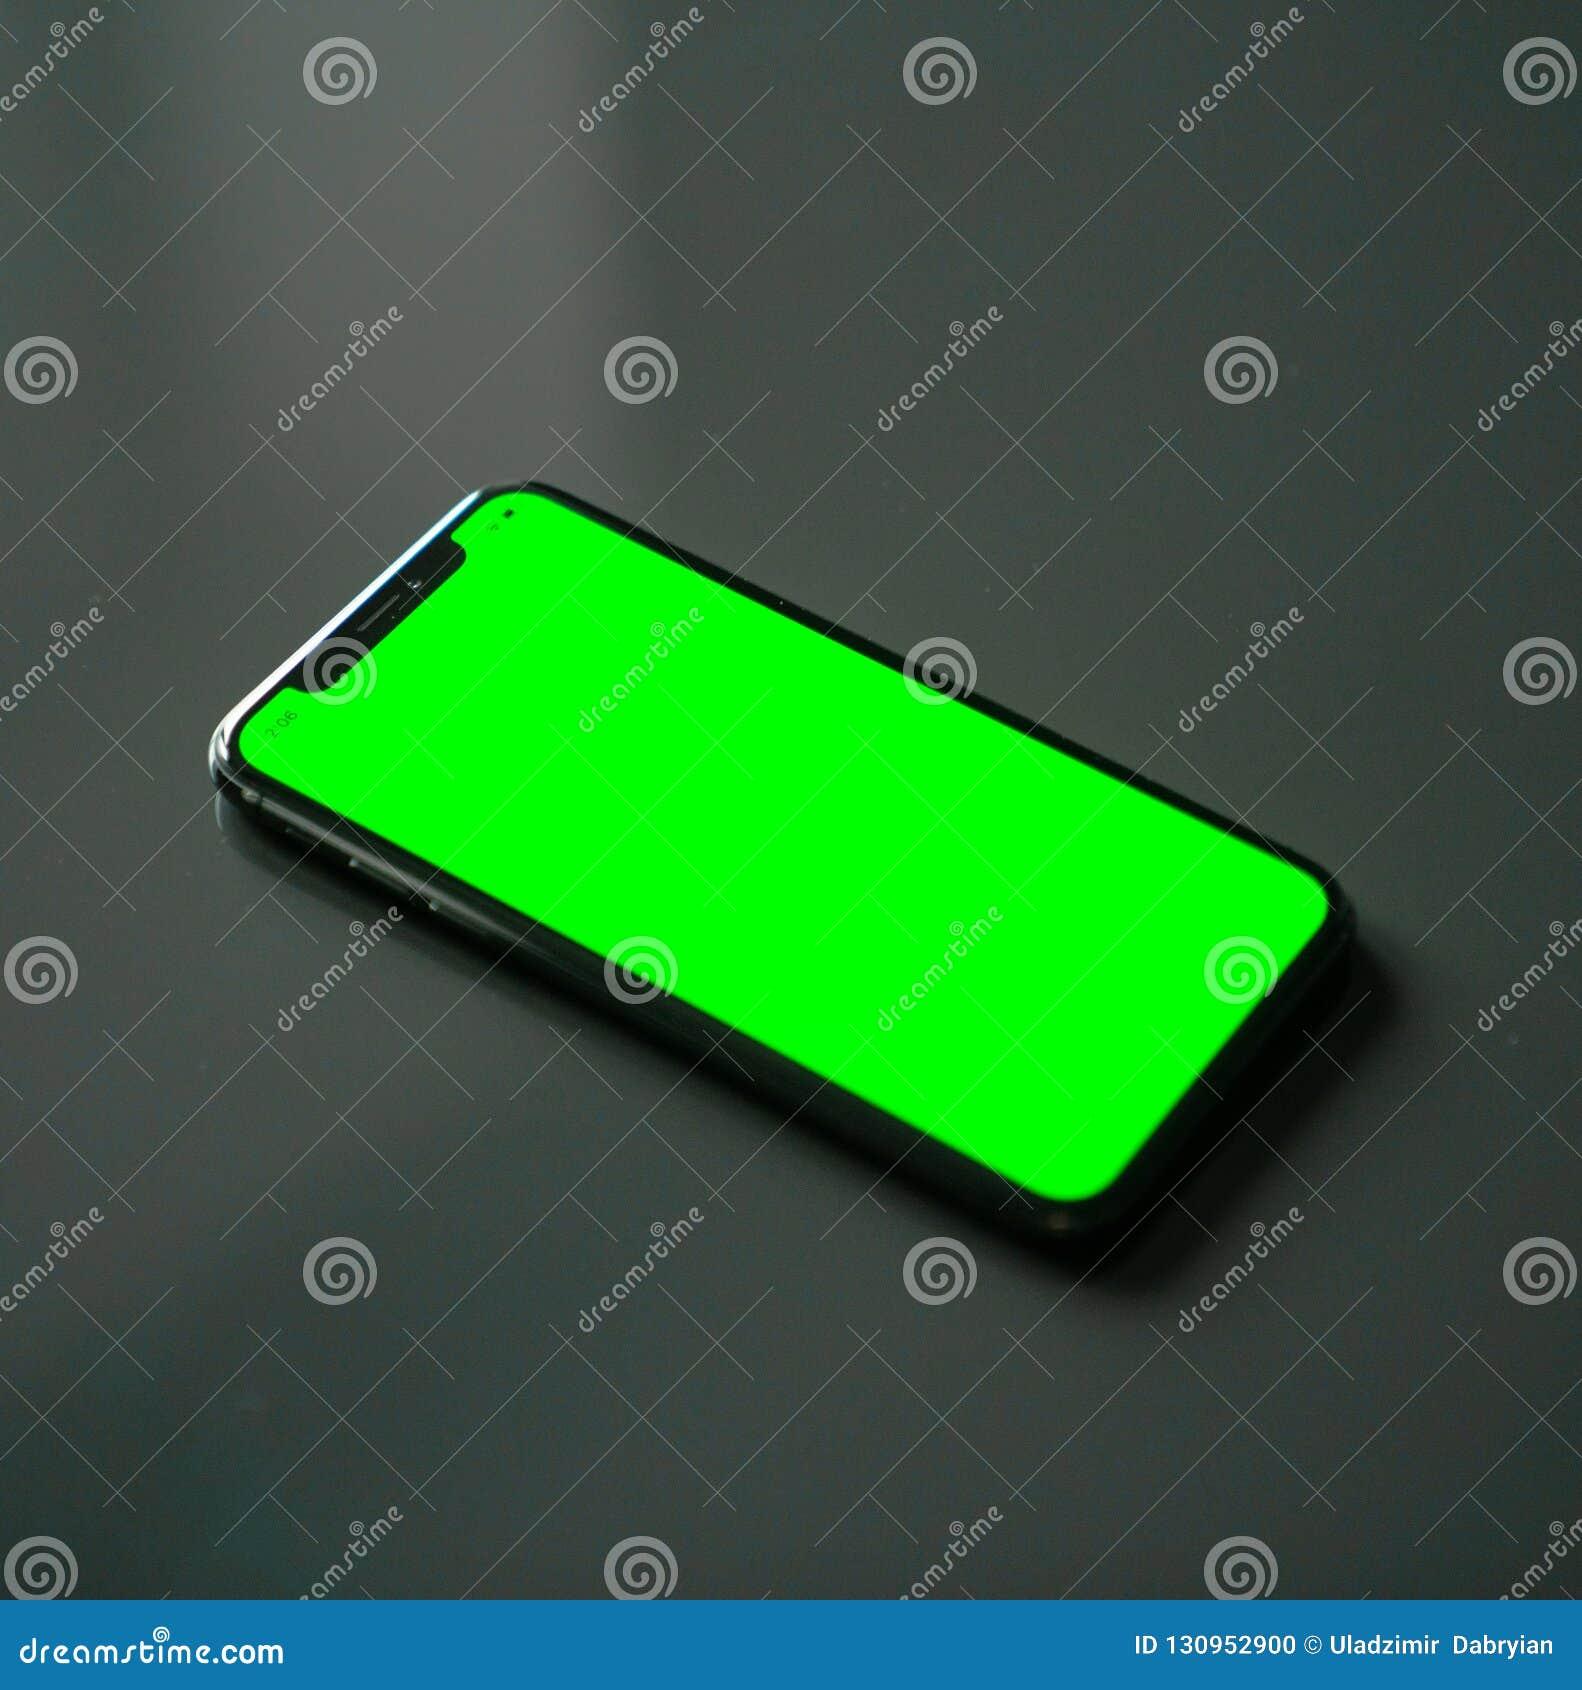 Iphone X Ecran Vert Sur Un Fond Gris Photo Stock Image Du Fond Iphone 130952900